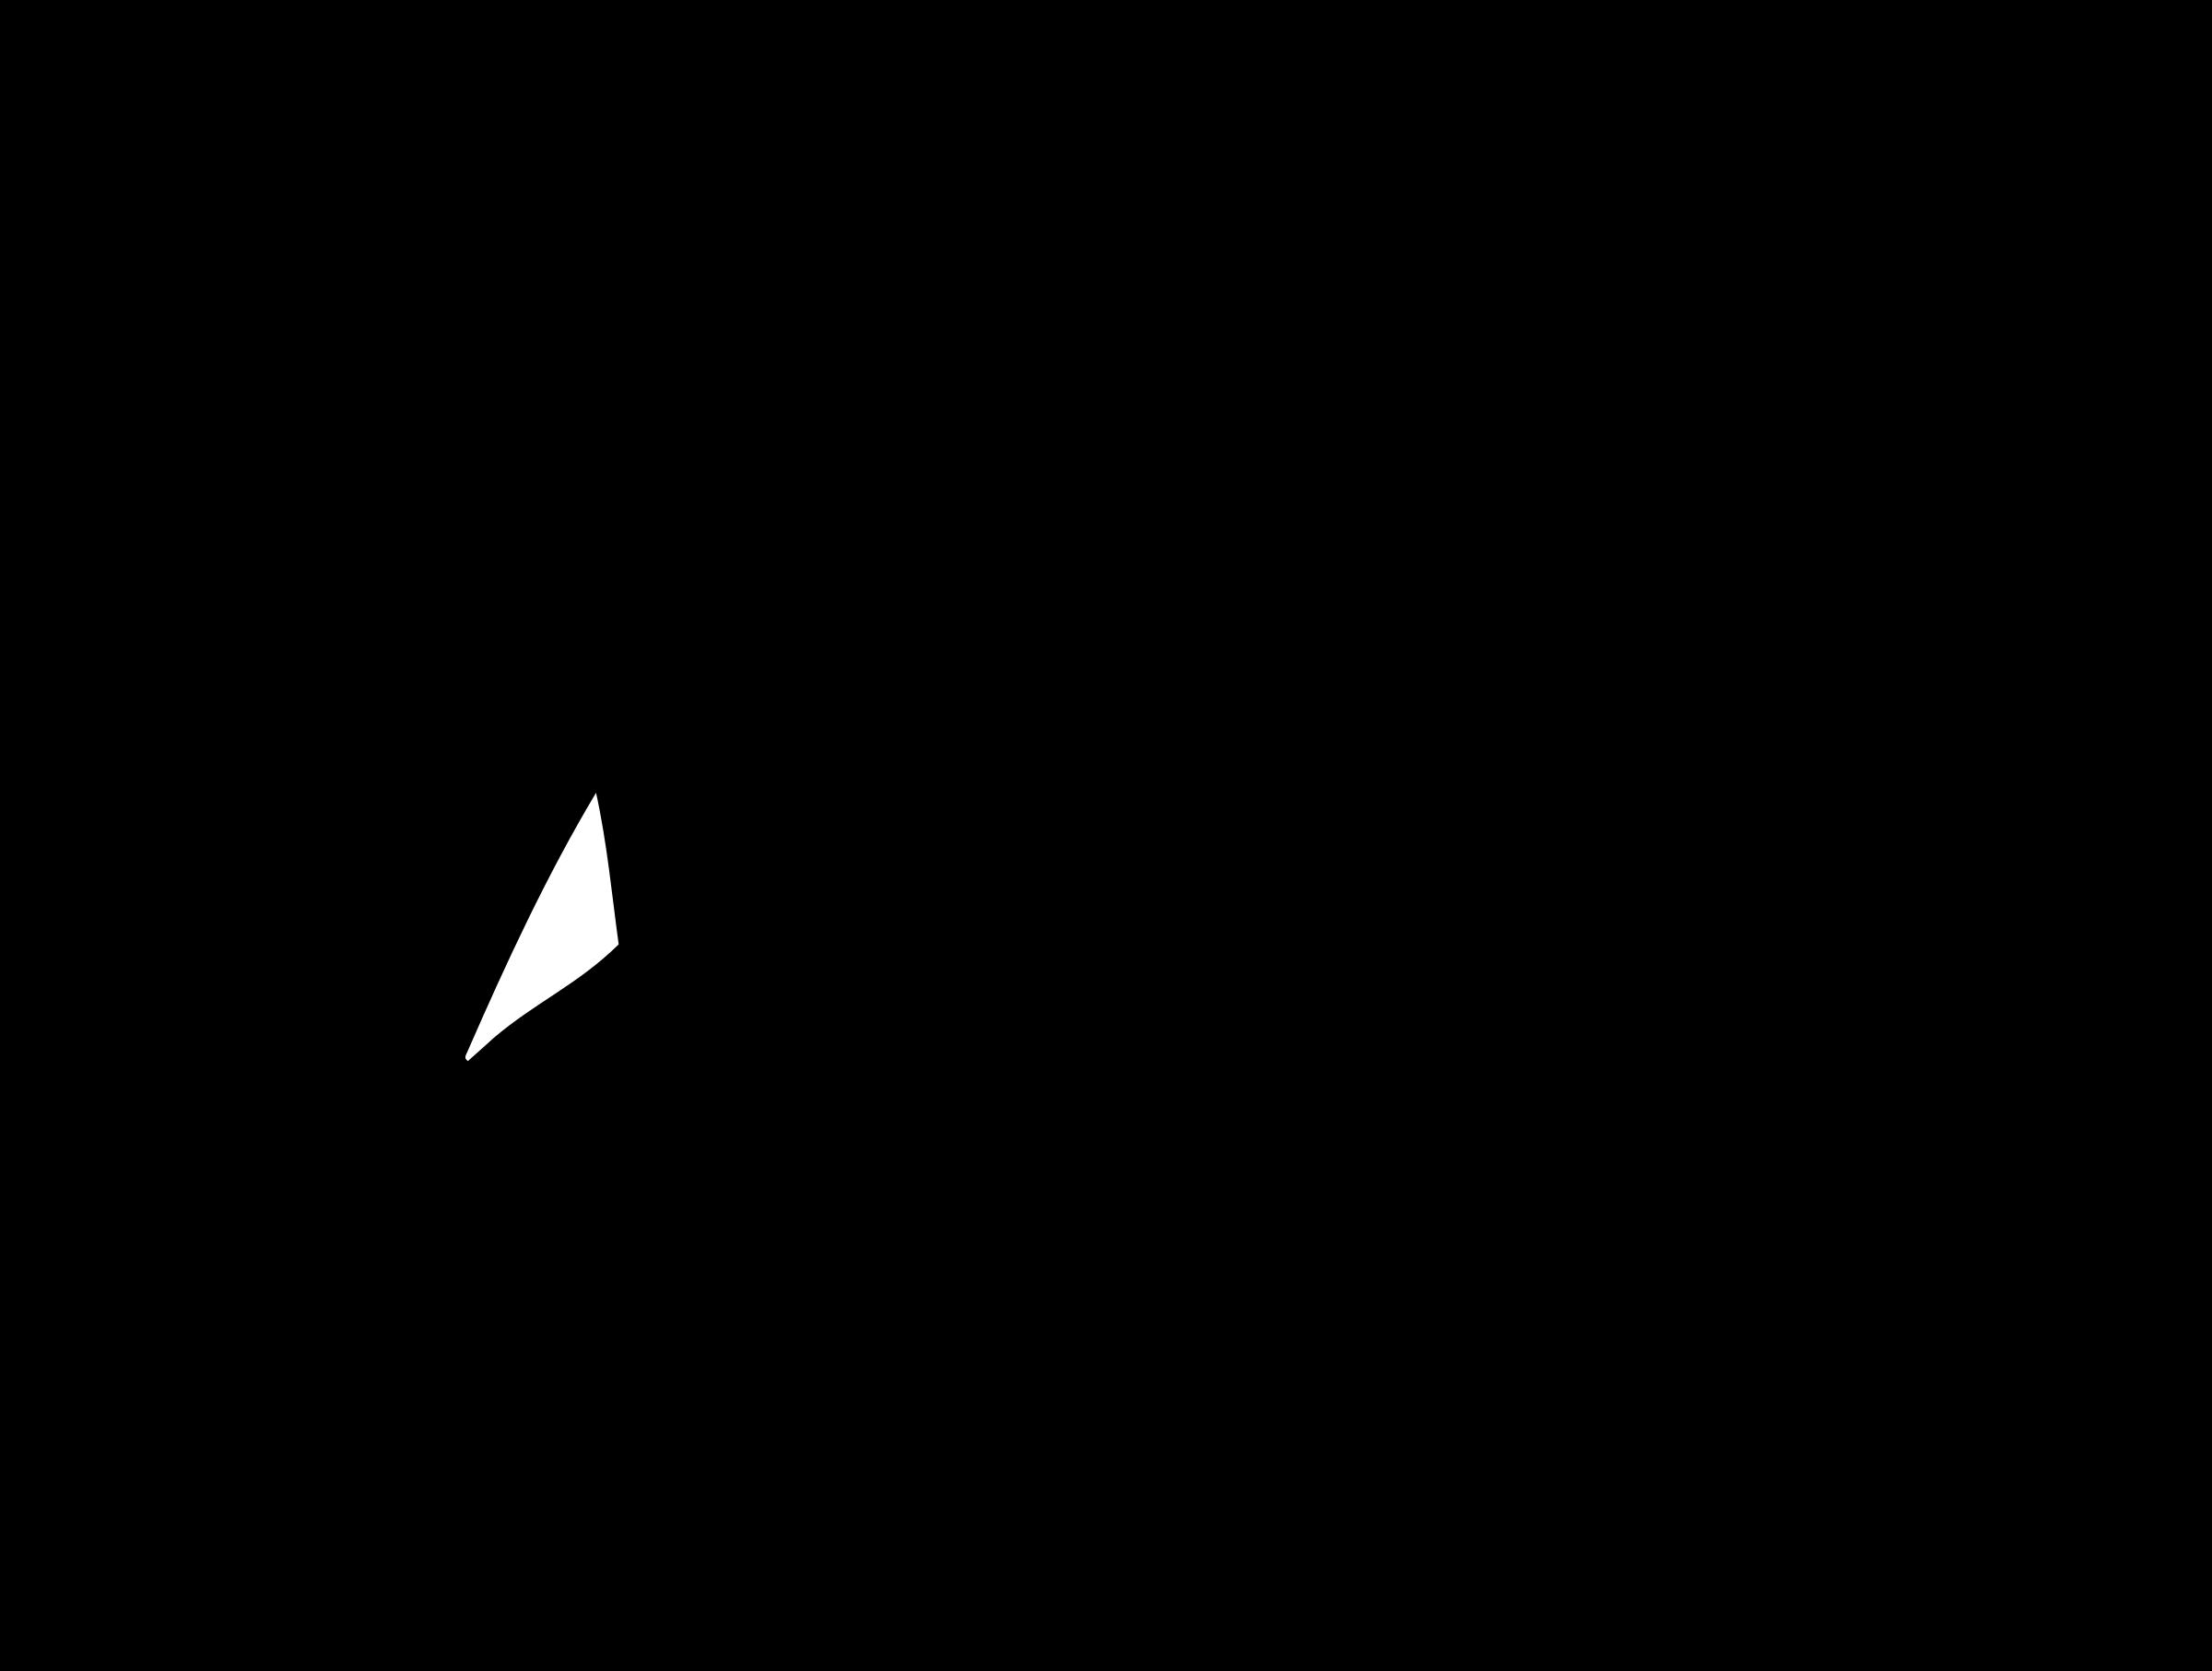 Caliente Logo PNG Transparent & SVG Vector.